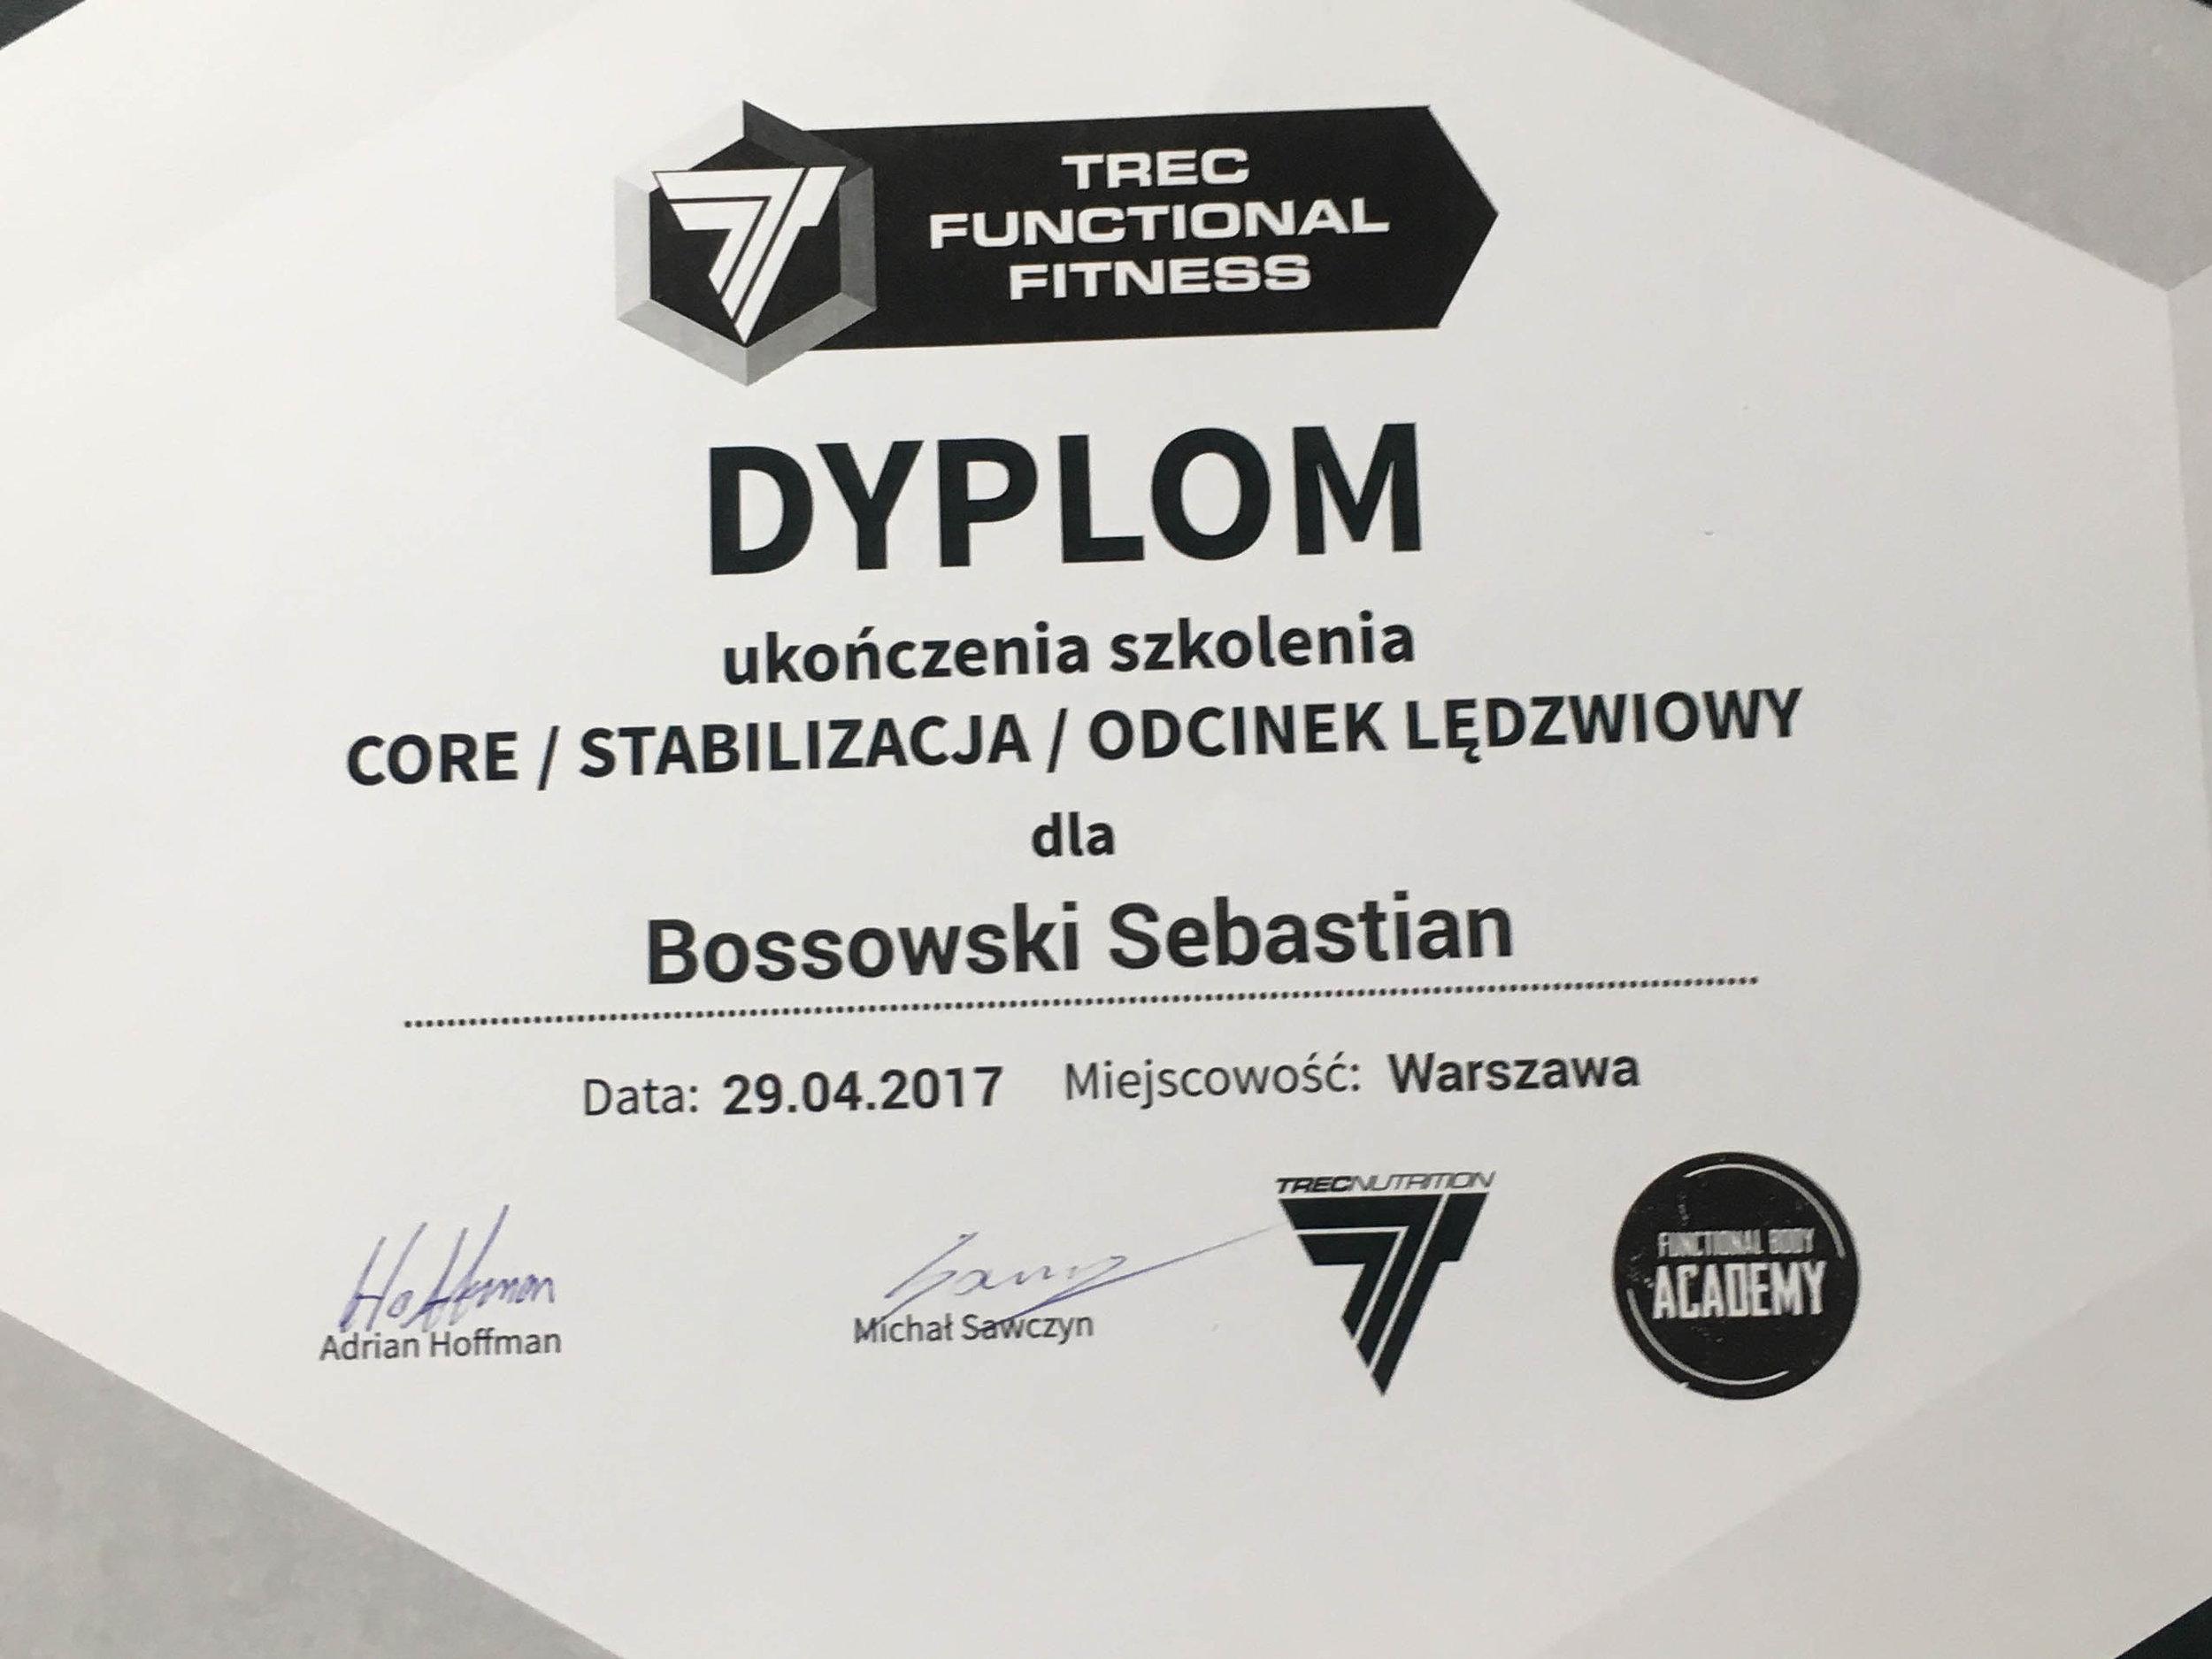 Sebastian Bossowski certyfikat 6.jpg